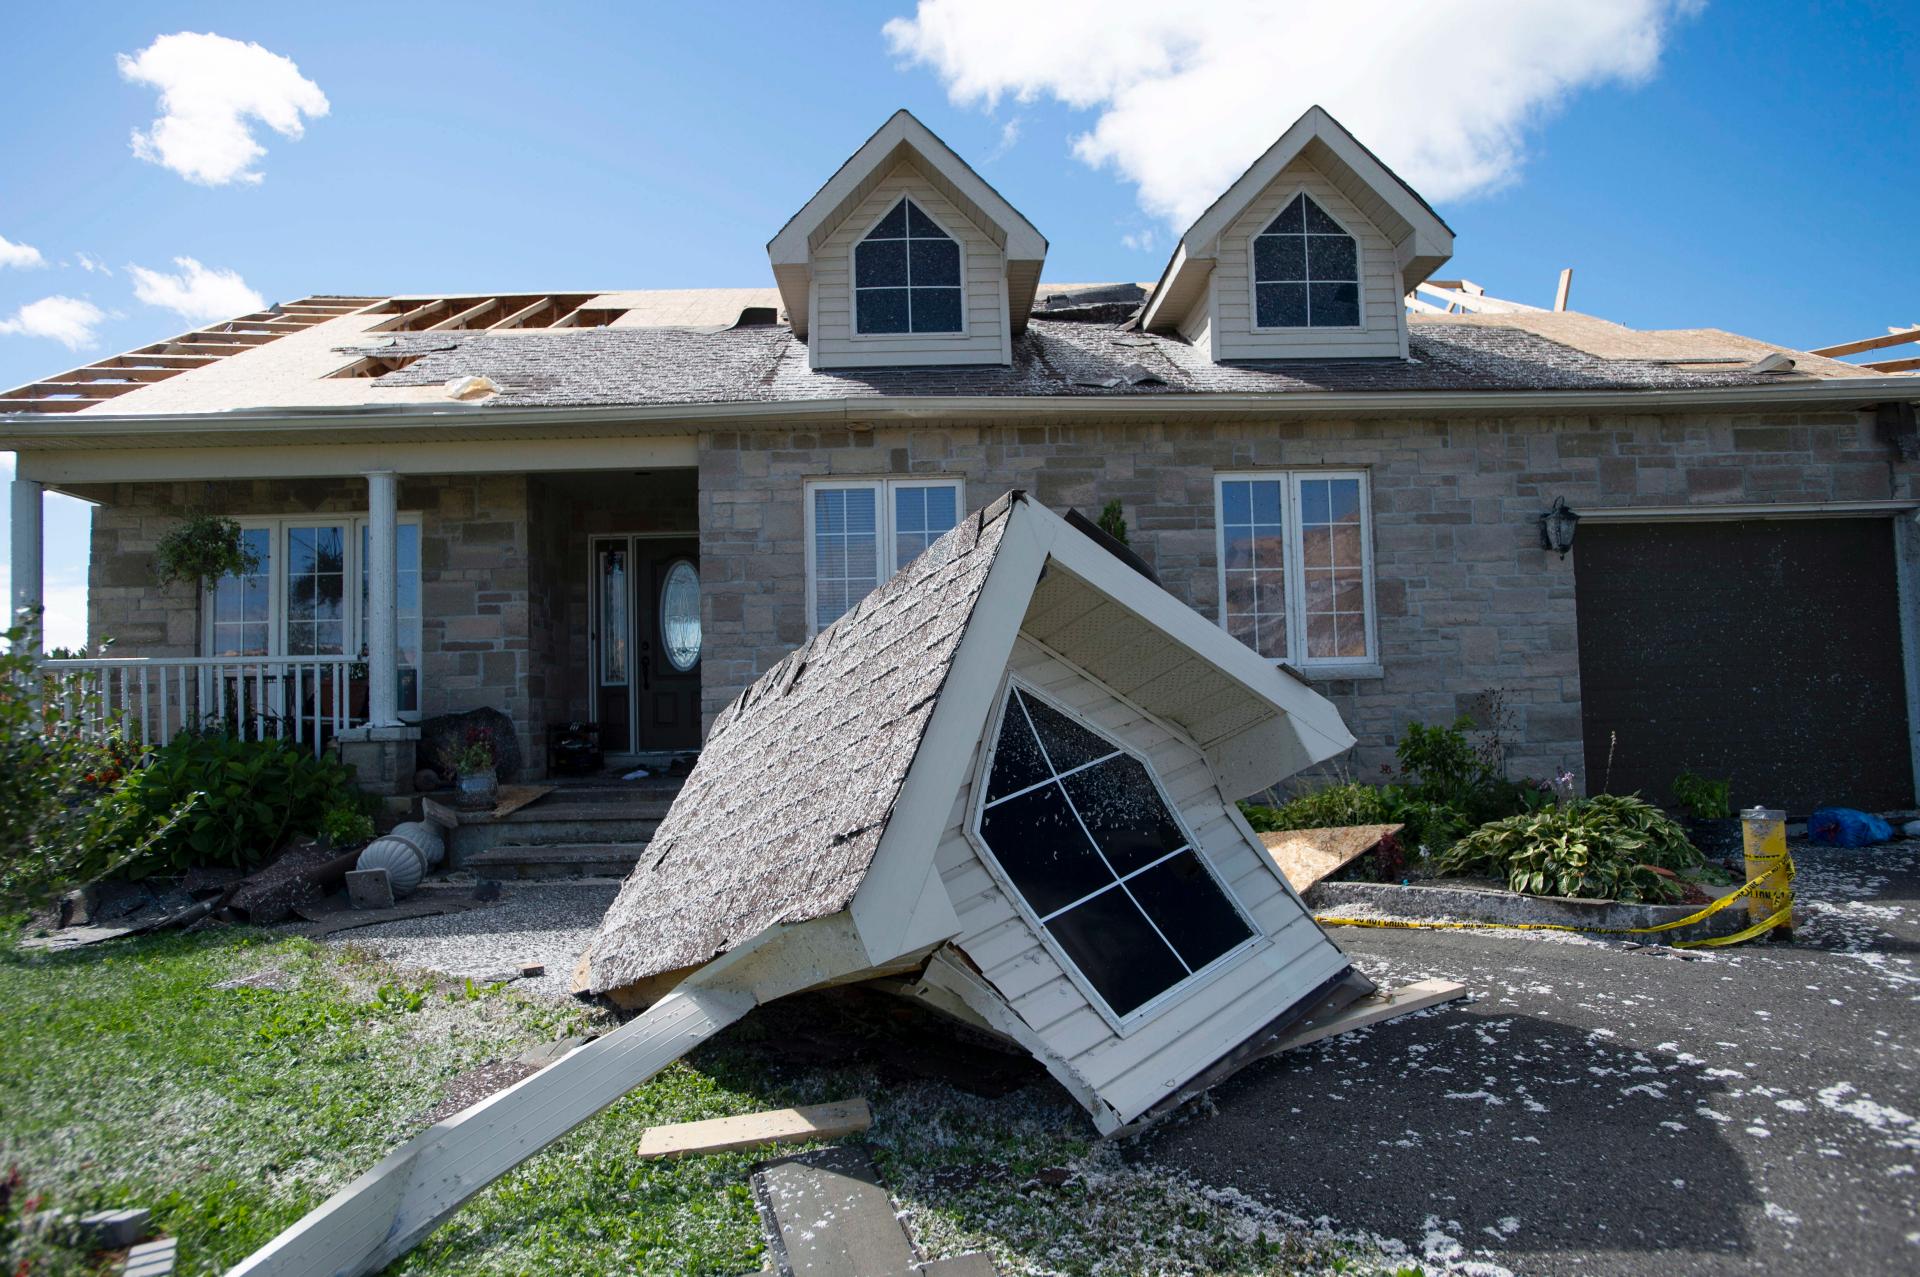 Canada's capital reeling after tornado hammers communities